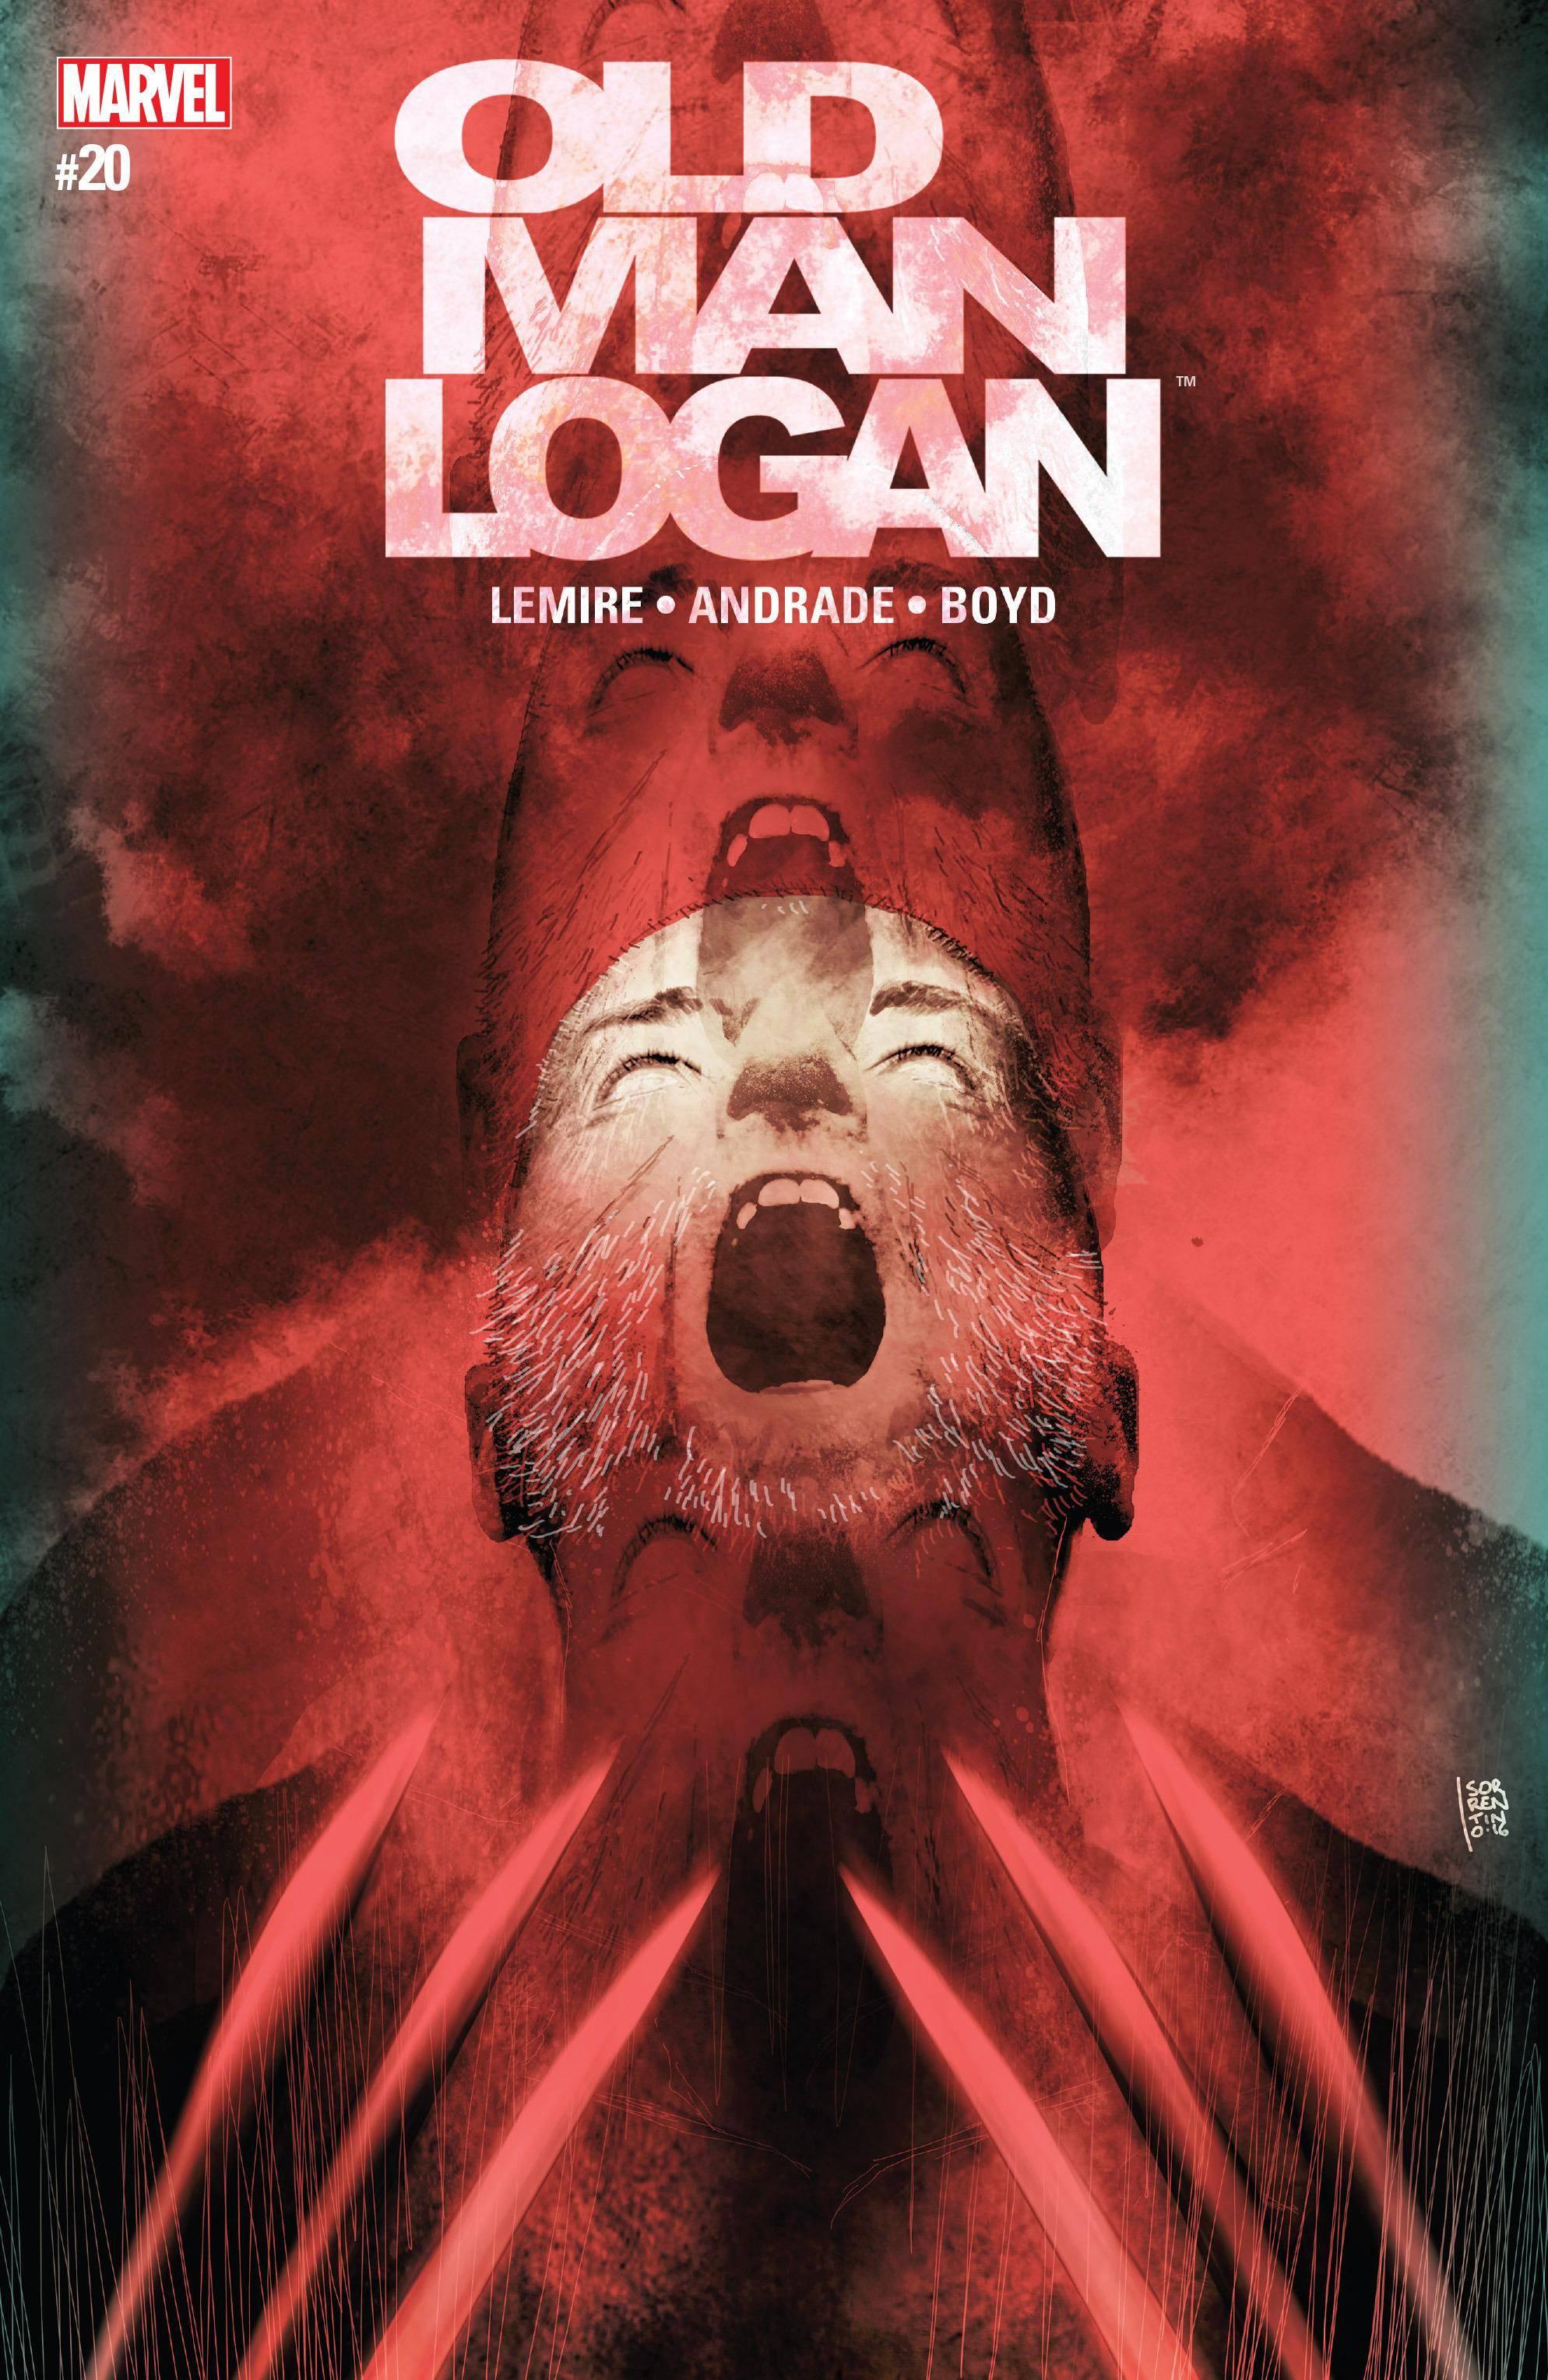 Old Man Logan 020 2017 Digital Zone-Empire